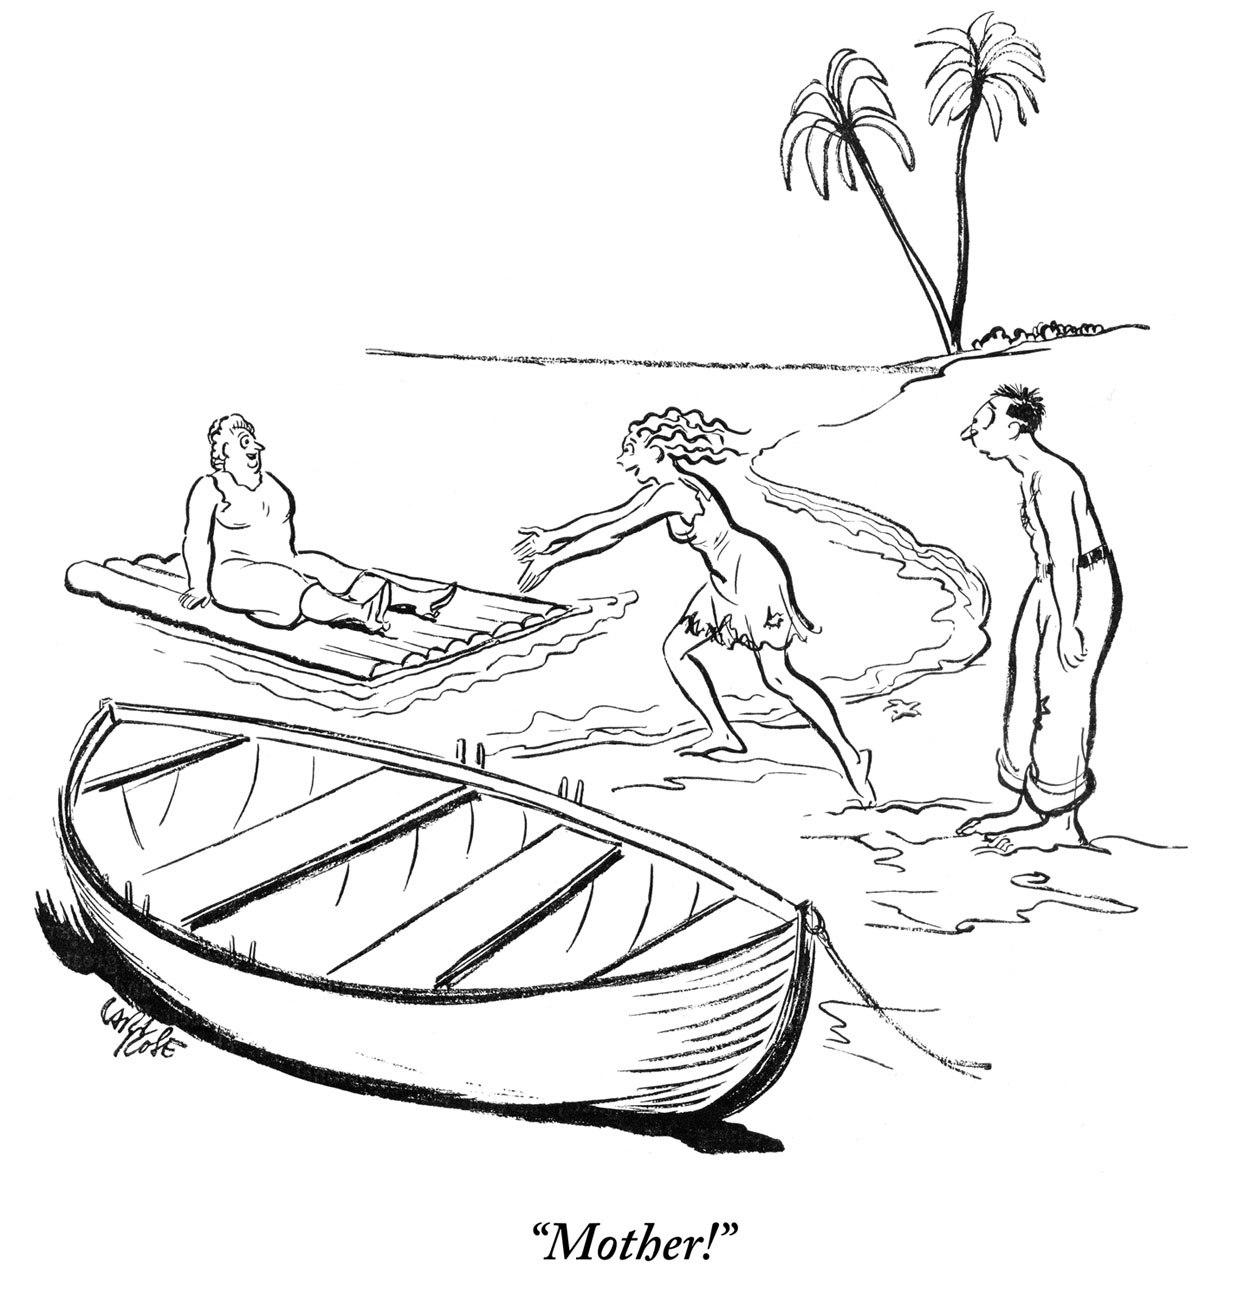 Drawn island deserted Desert Guy a Cartoon Palm